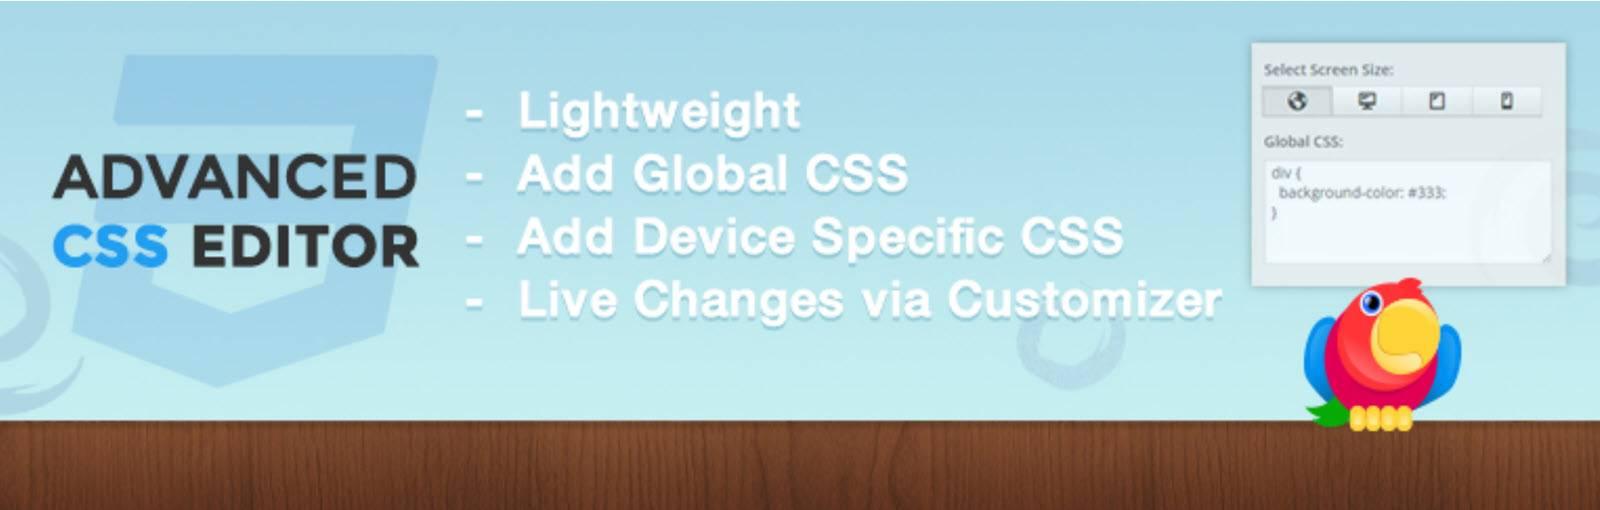 Advanced CSS - Best WordPress Plugins for Developers